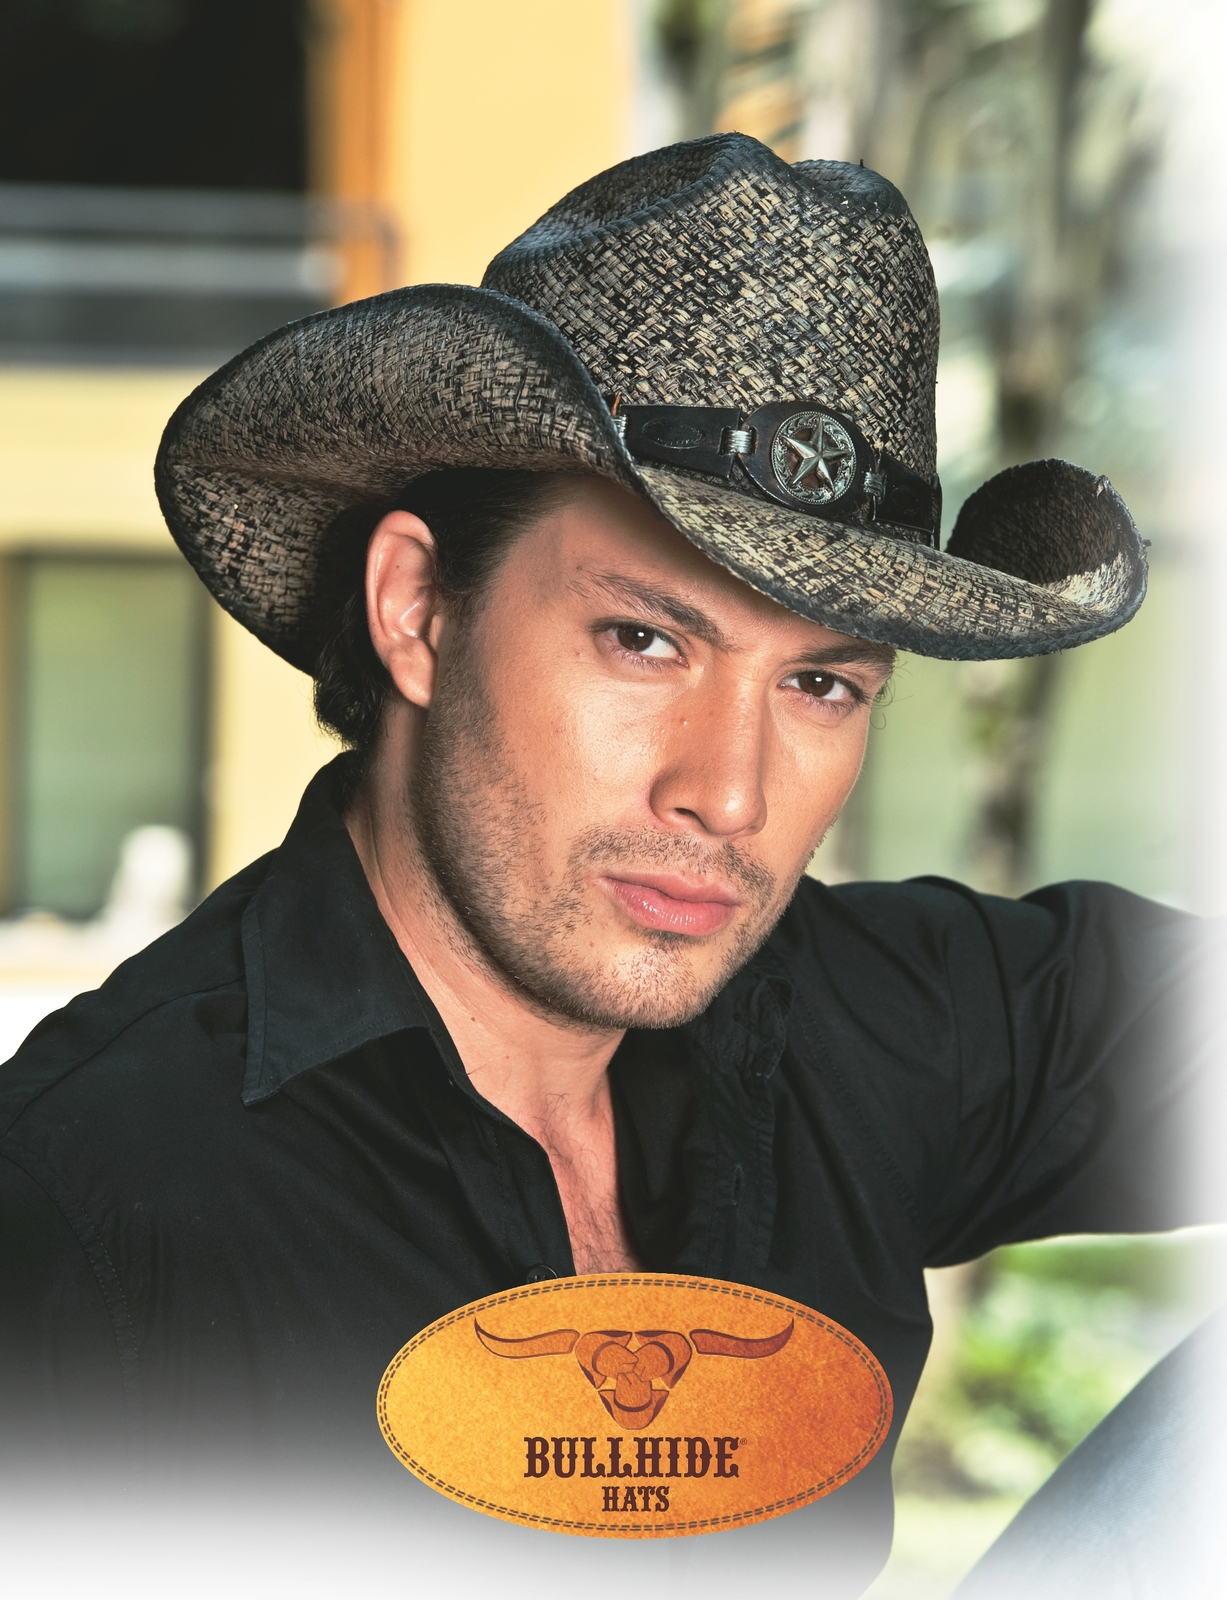 Bullhide Star Central Panama Straw Cowboy Hat Star Concho Black Natural image 4